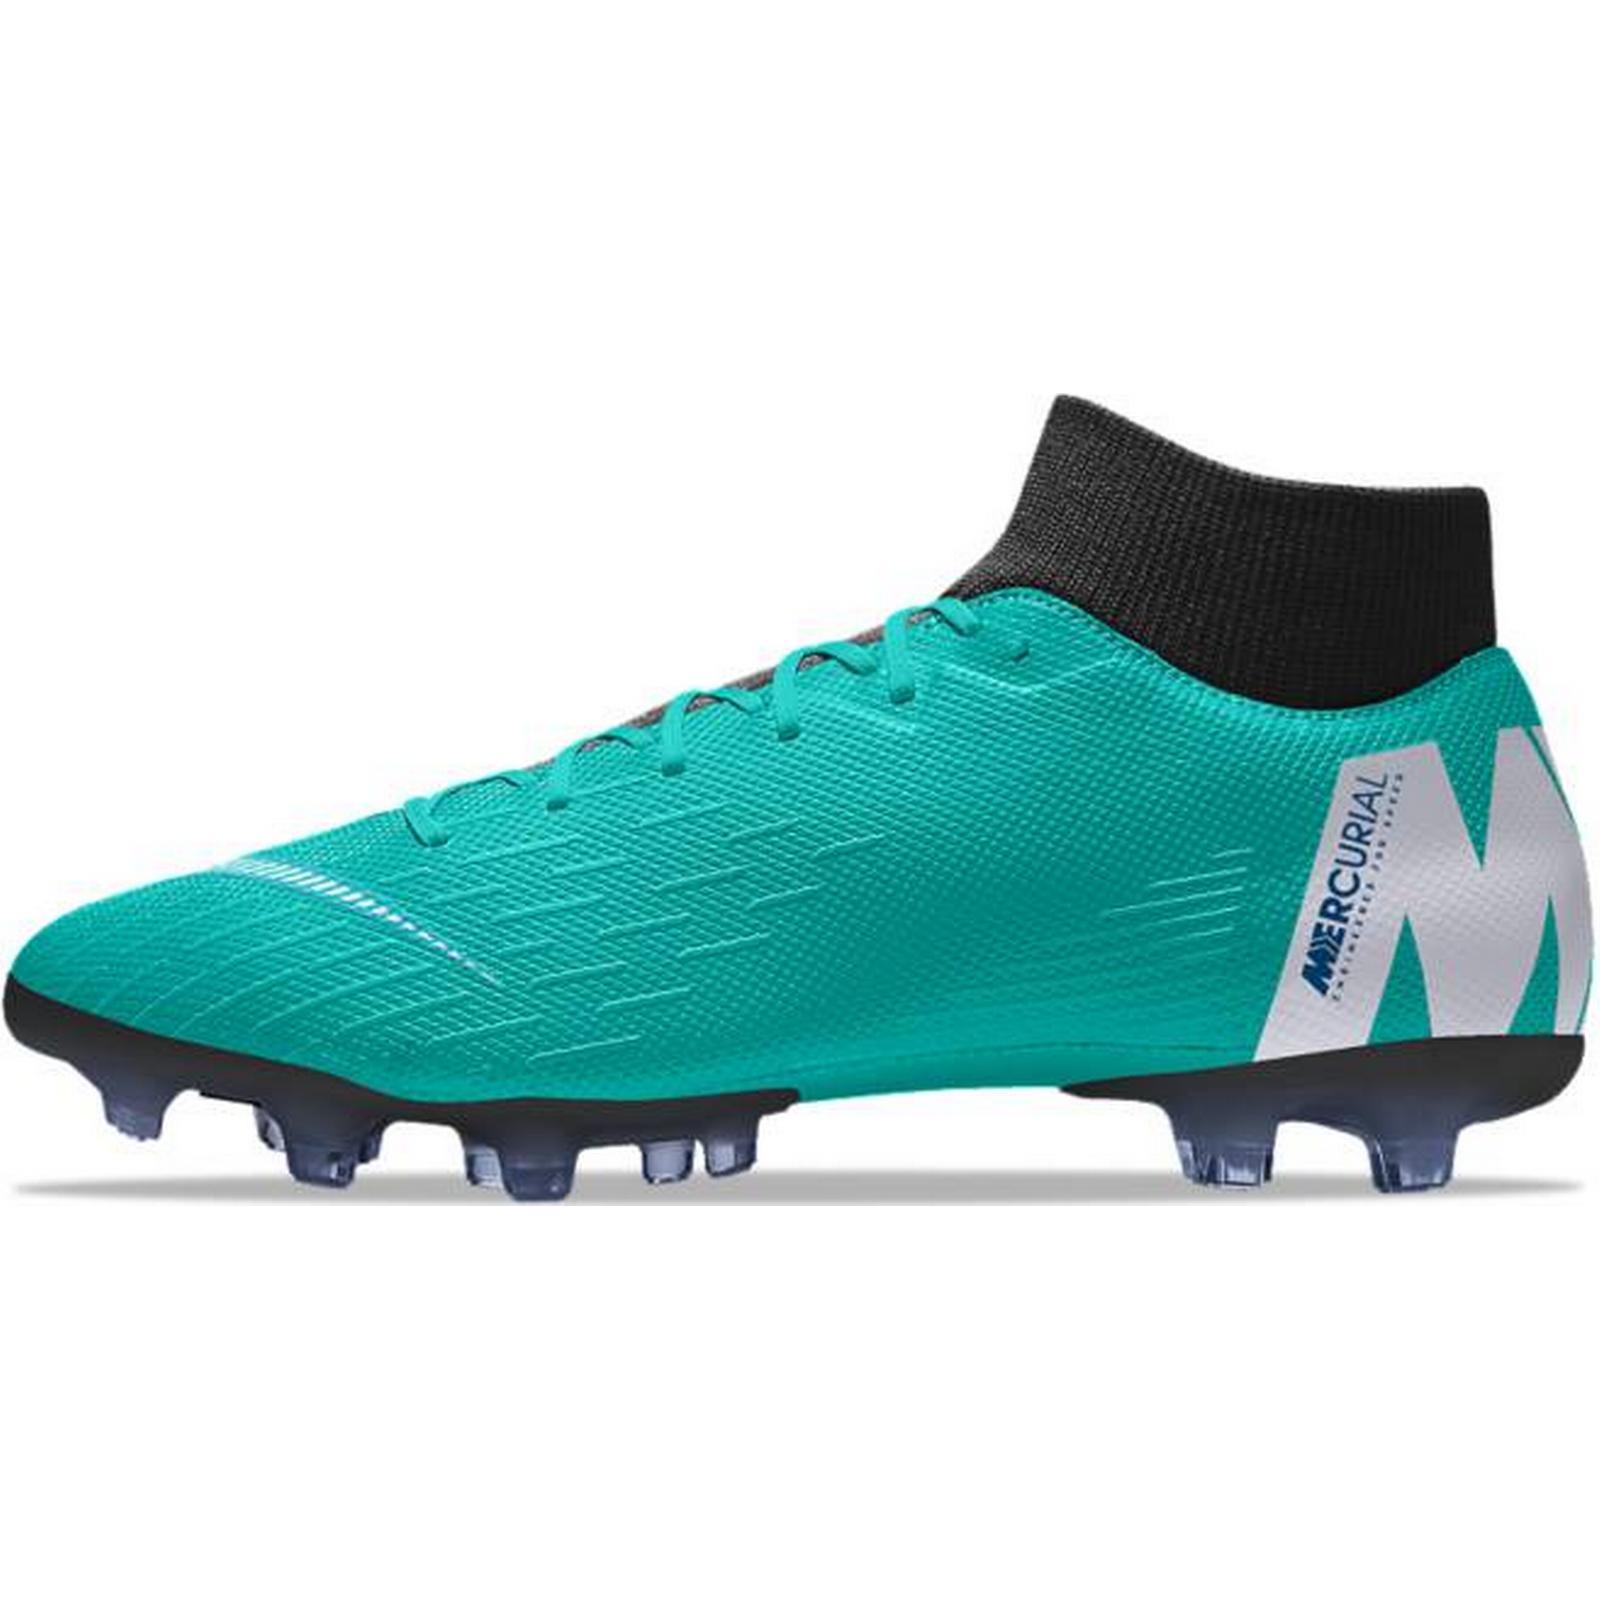 NIKE Korki Piłkarskie Na Różne VI Nawierzchnie Nike Mercurial Superfly VI Różne Academy MG ID e1f098